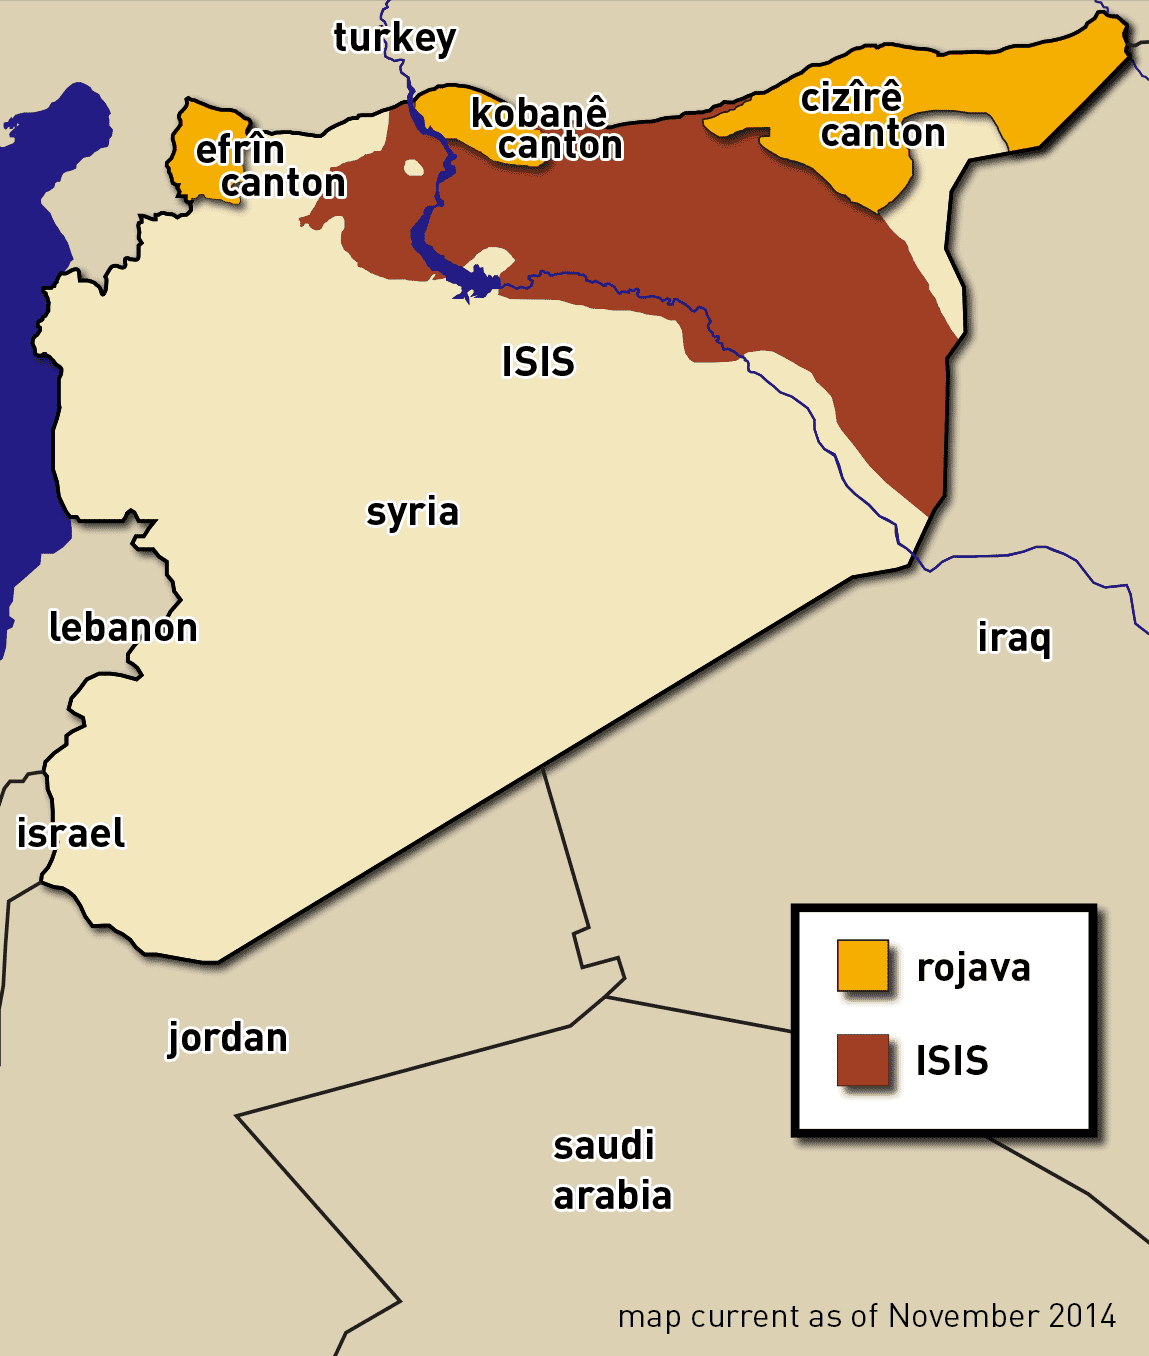 1-Rojava